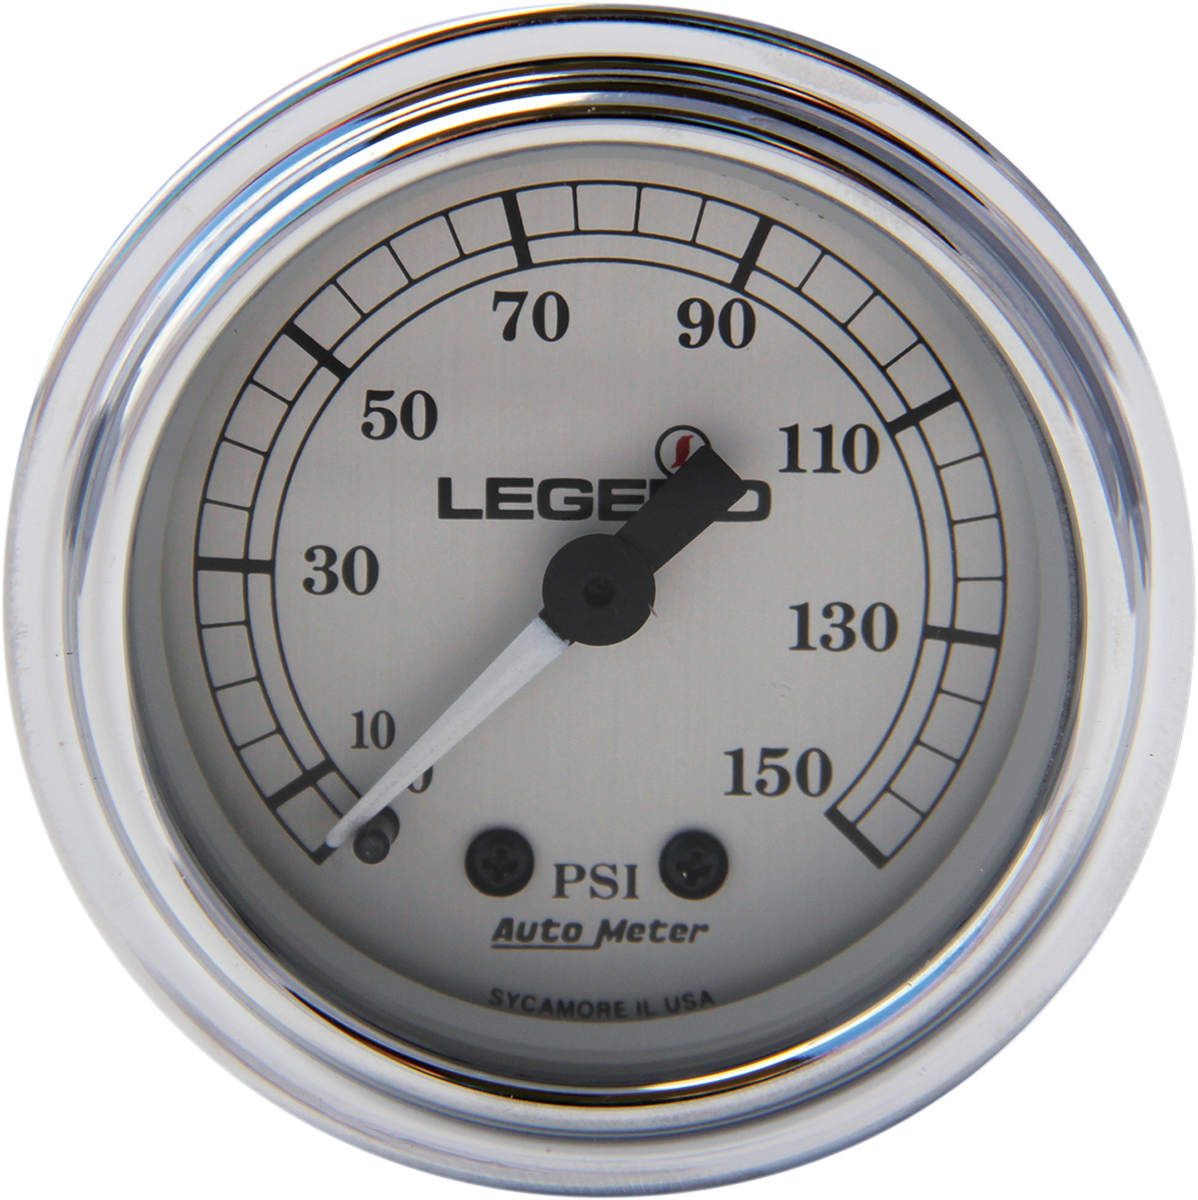 Legends chrome front fairing air pressure psi gauge harley